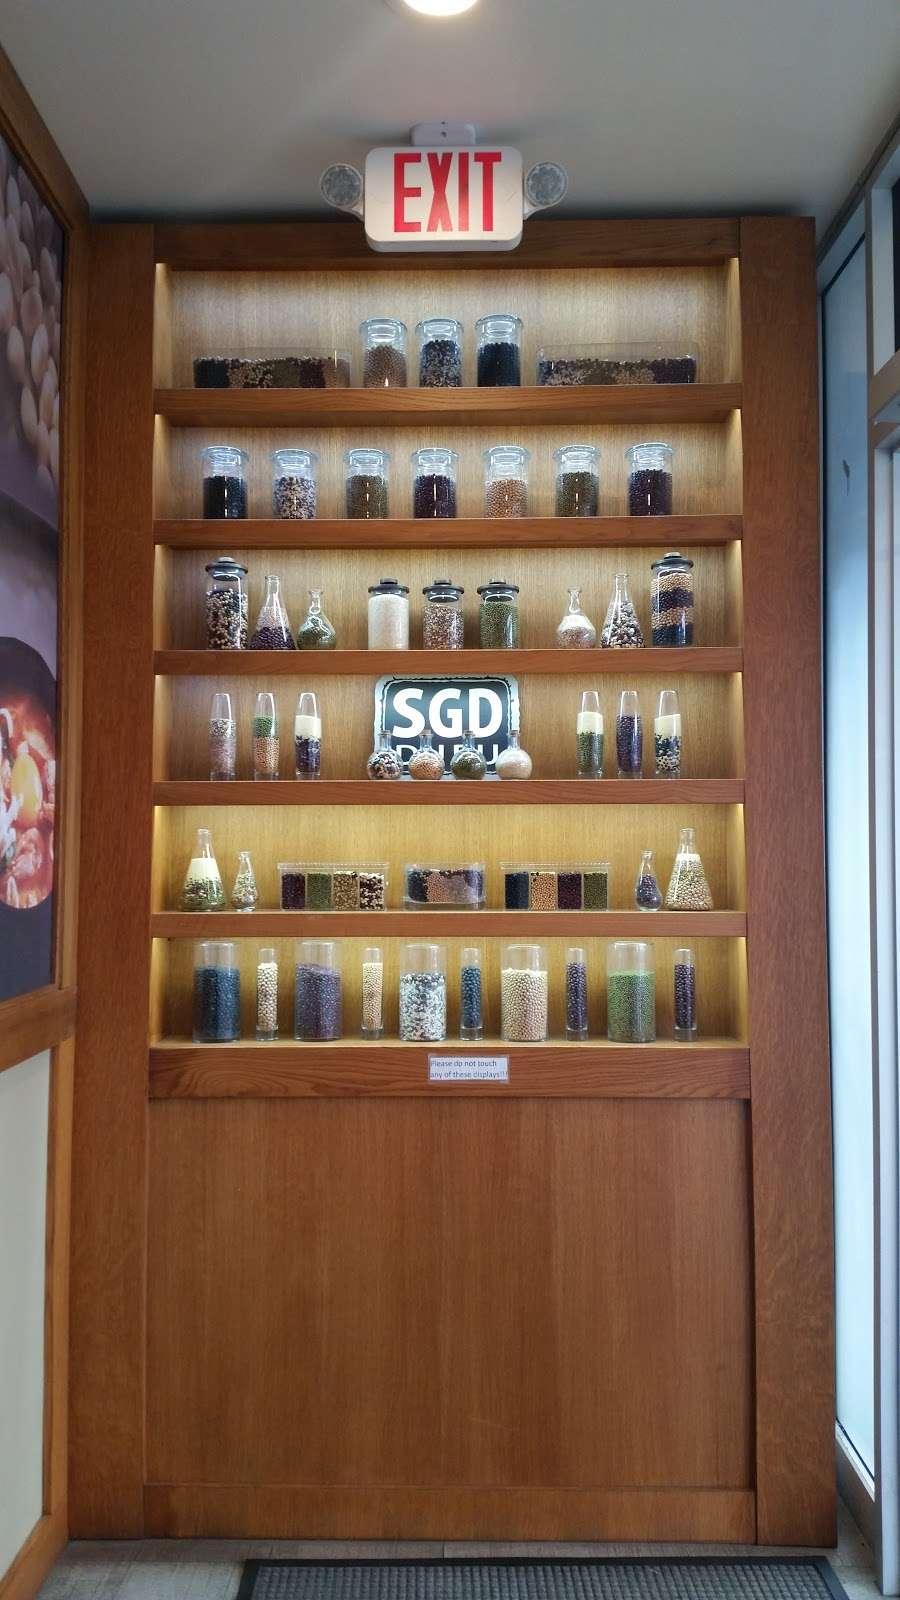 SGD DUBU SO GONG DONG TOFU & KOREAN BBQ - restaurant  | Photo 6 of 10 | Address: 725 River Rd #45, Edgewater, NJ 07020, USA | Phone: (201) 945-5106